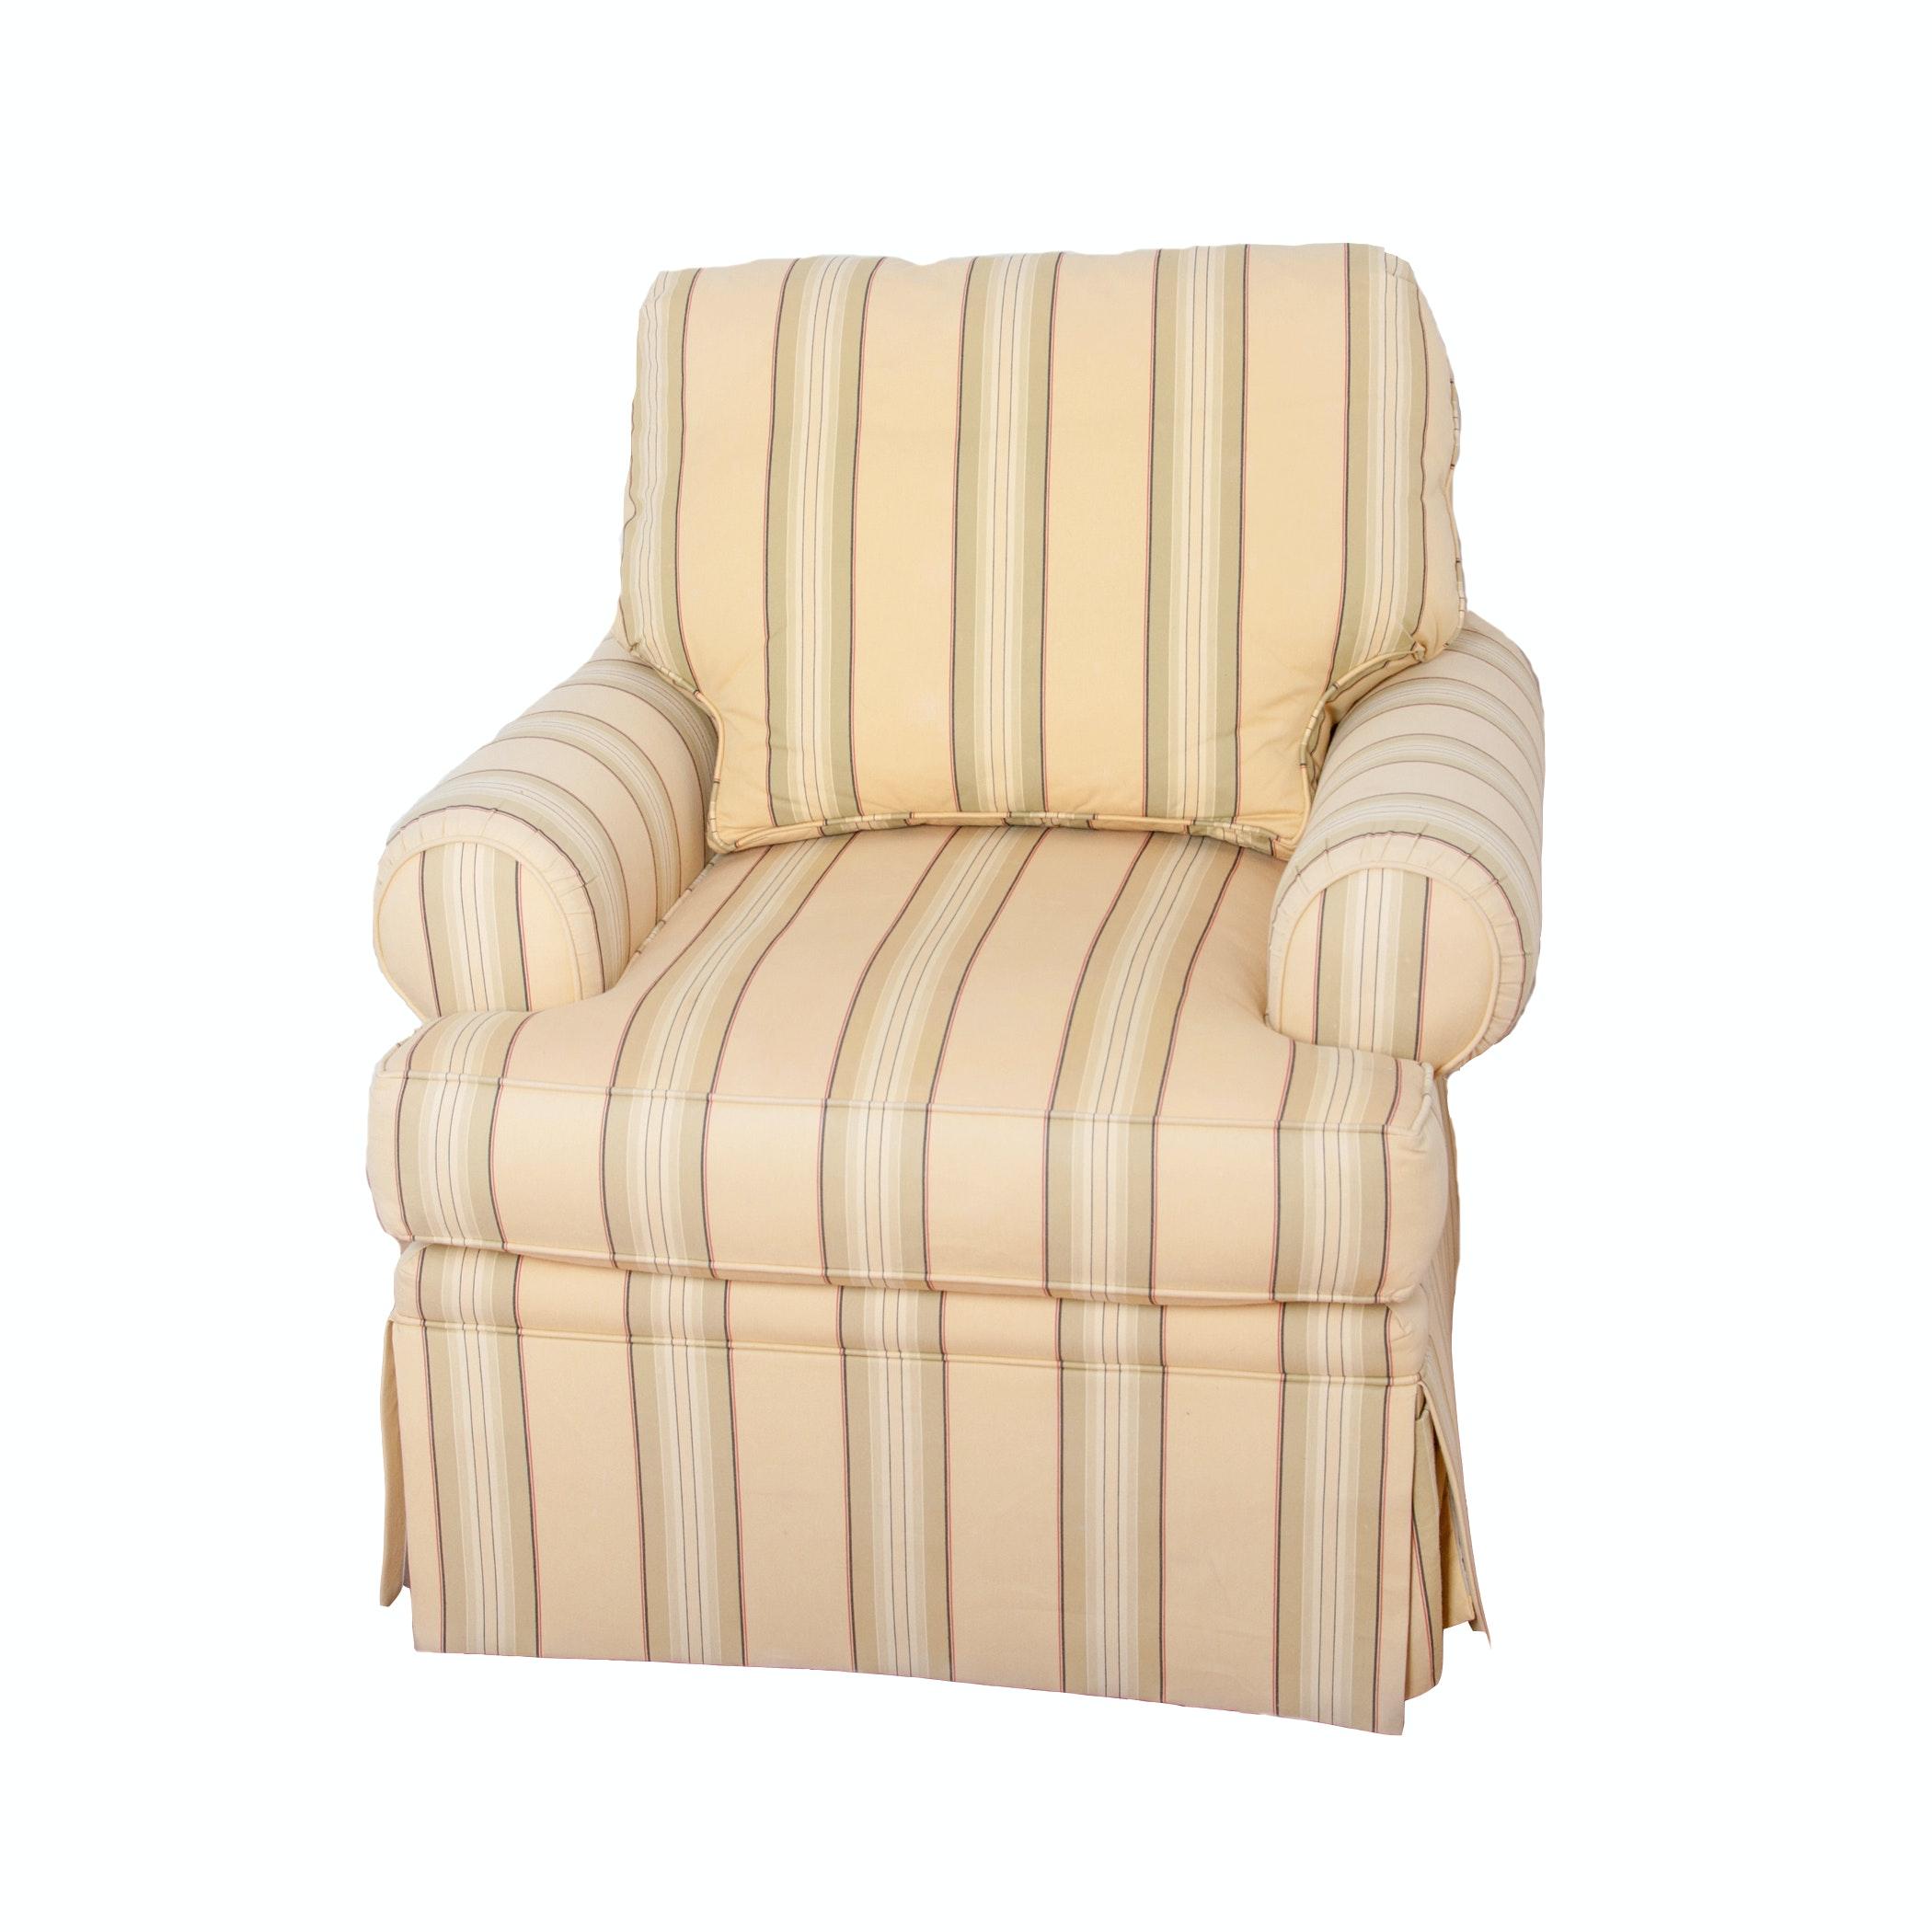 Yellow Striped Club Chair